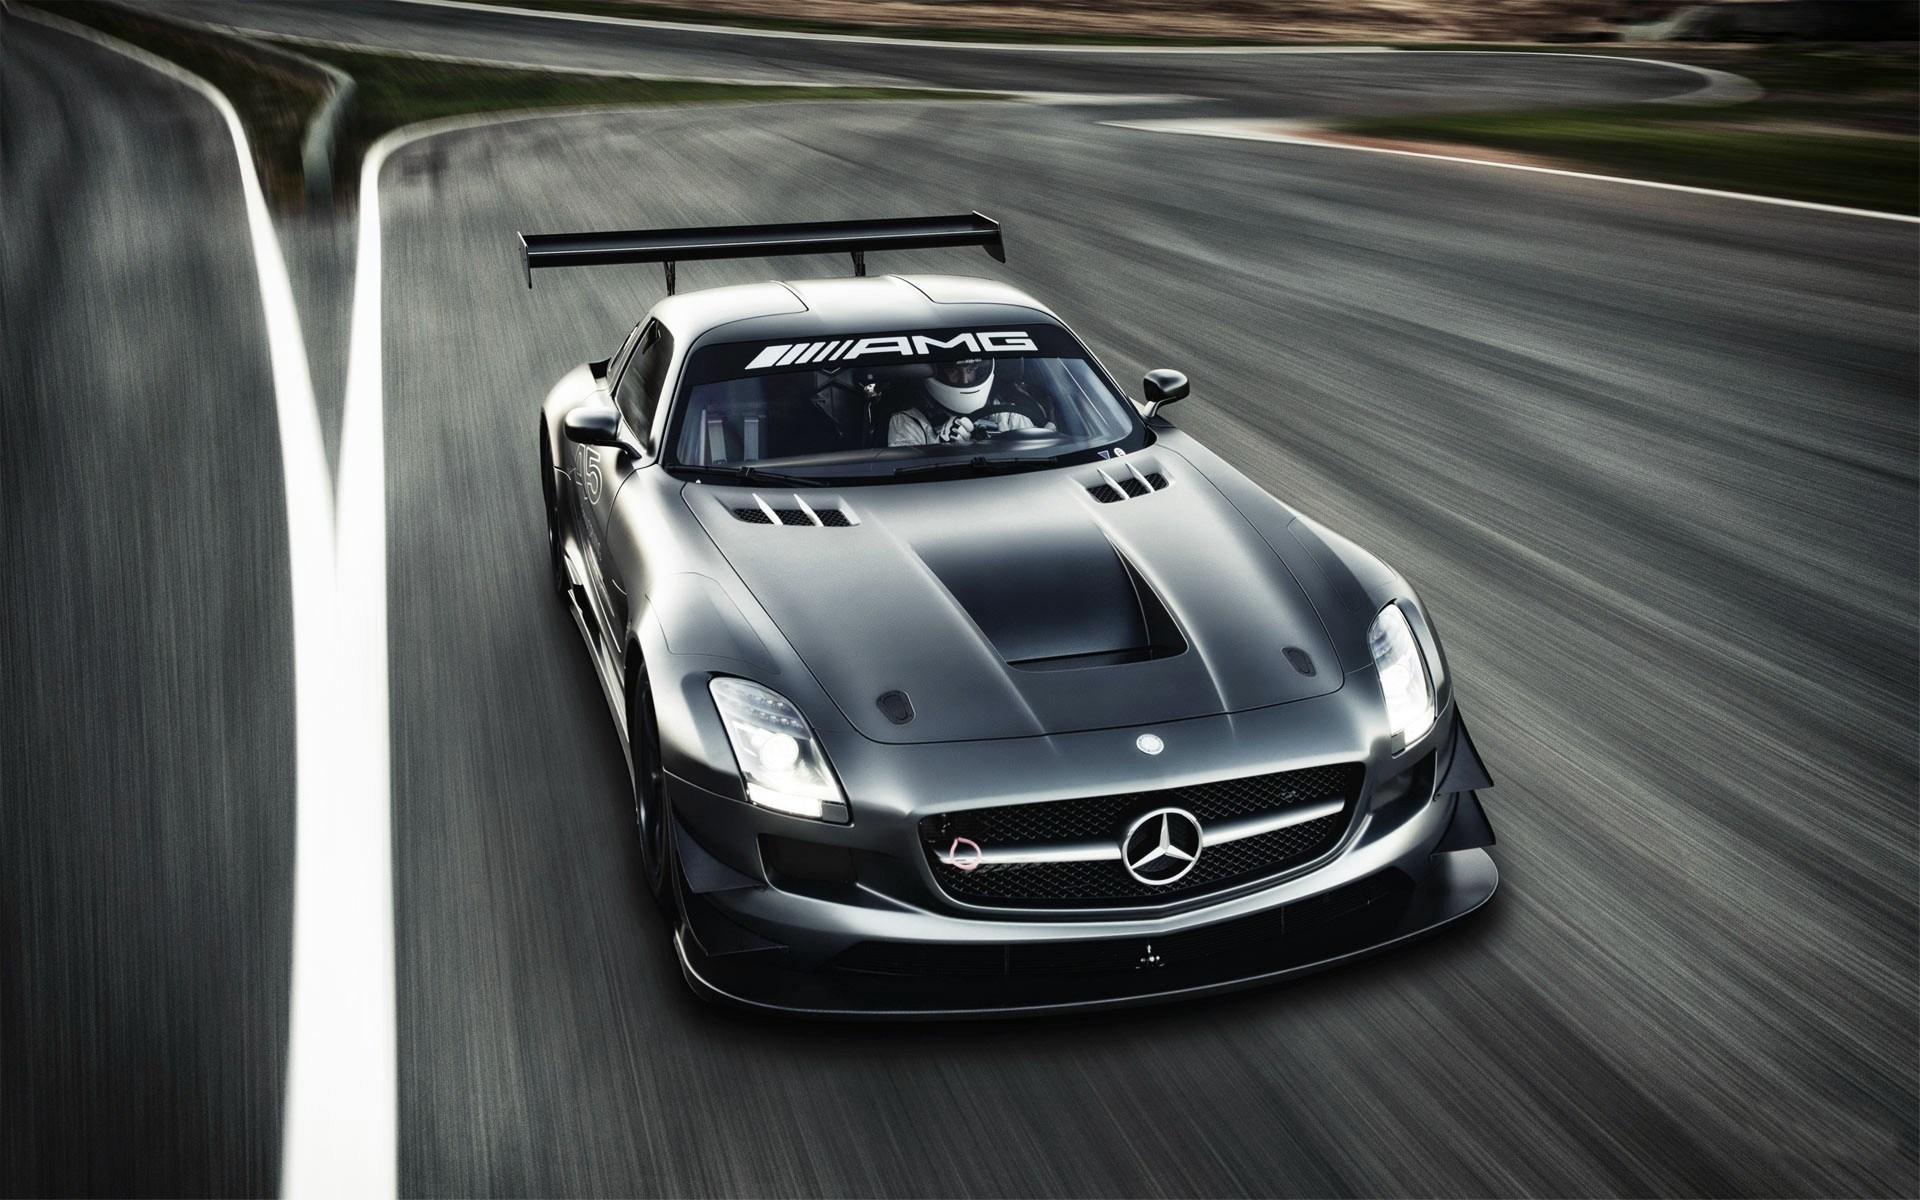 Mercedes Benz Sls Hd Wallpaper Background Image 1920x1200 Id